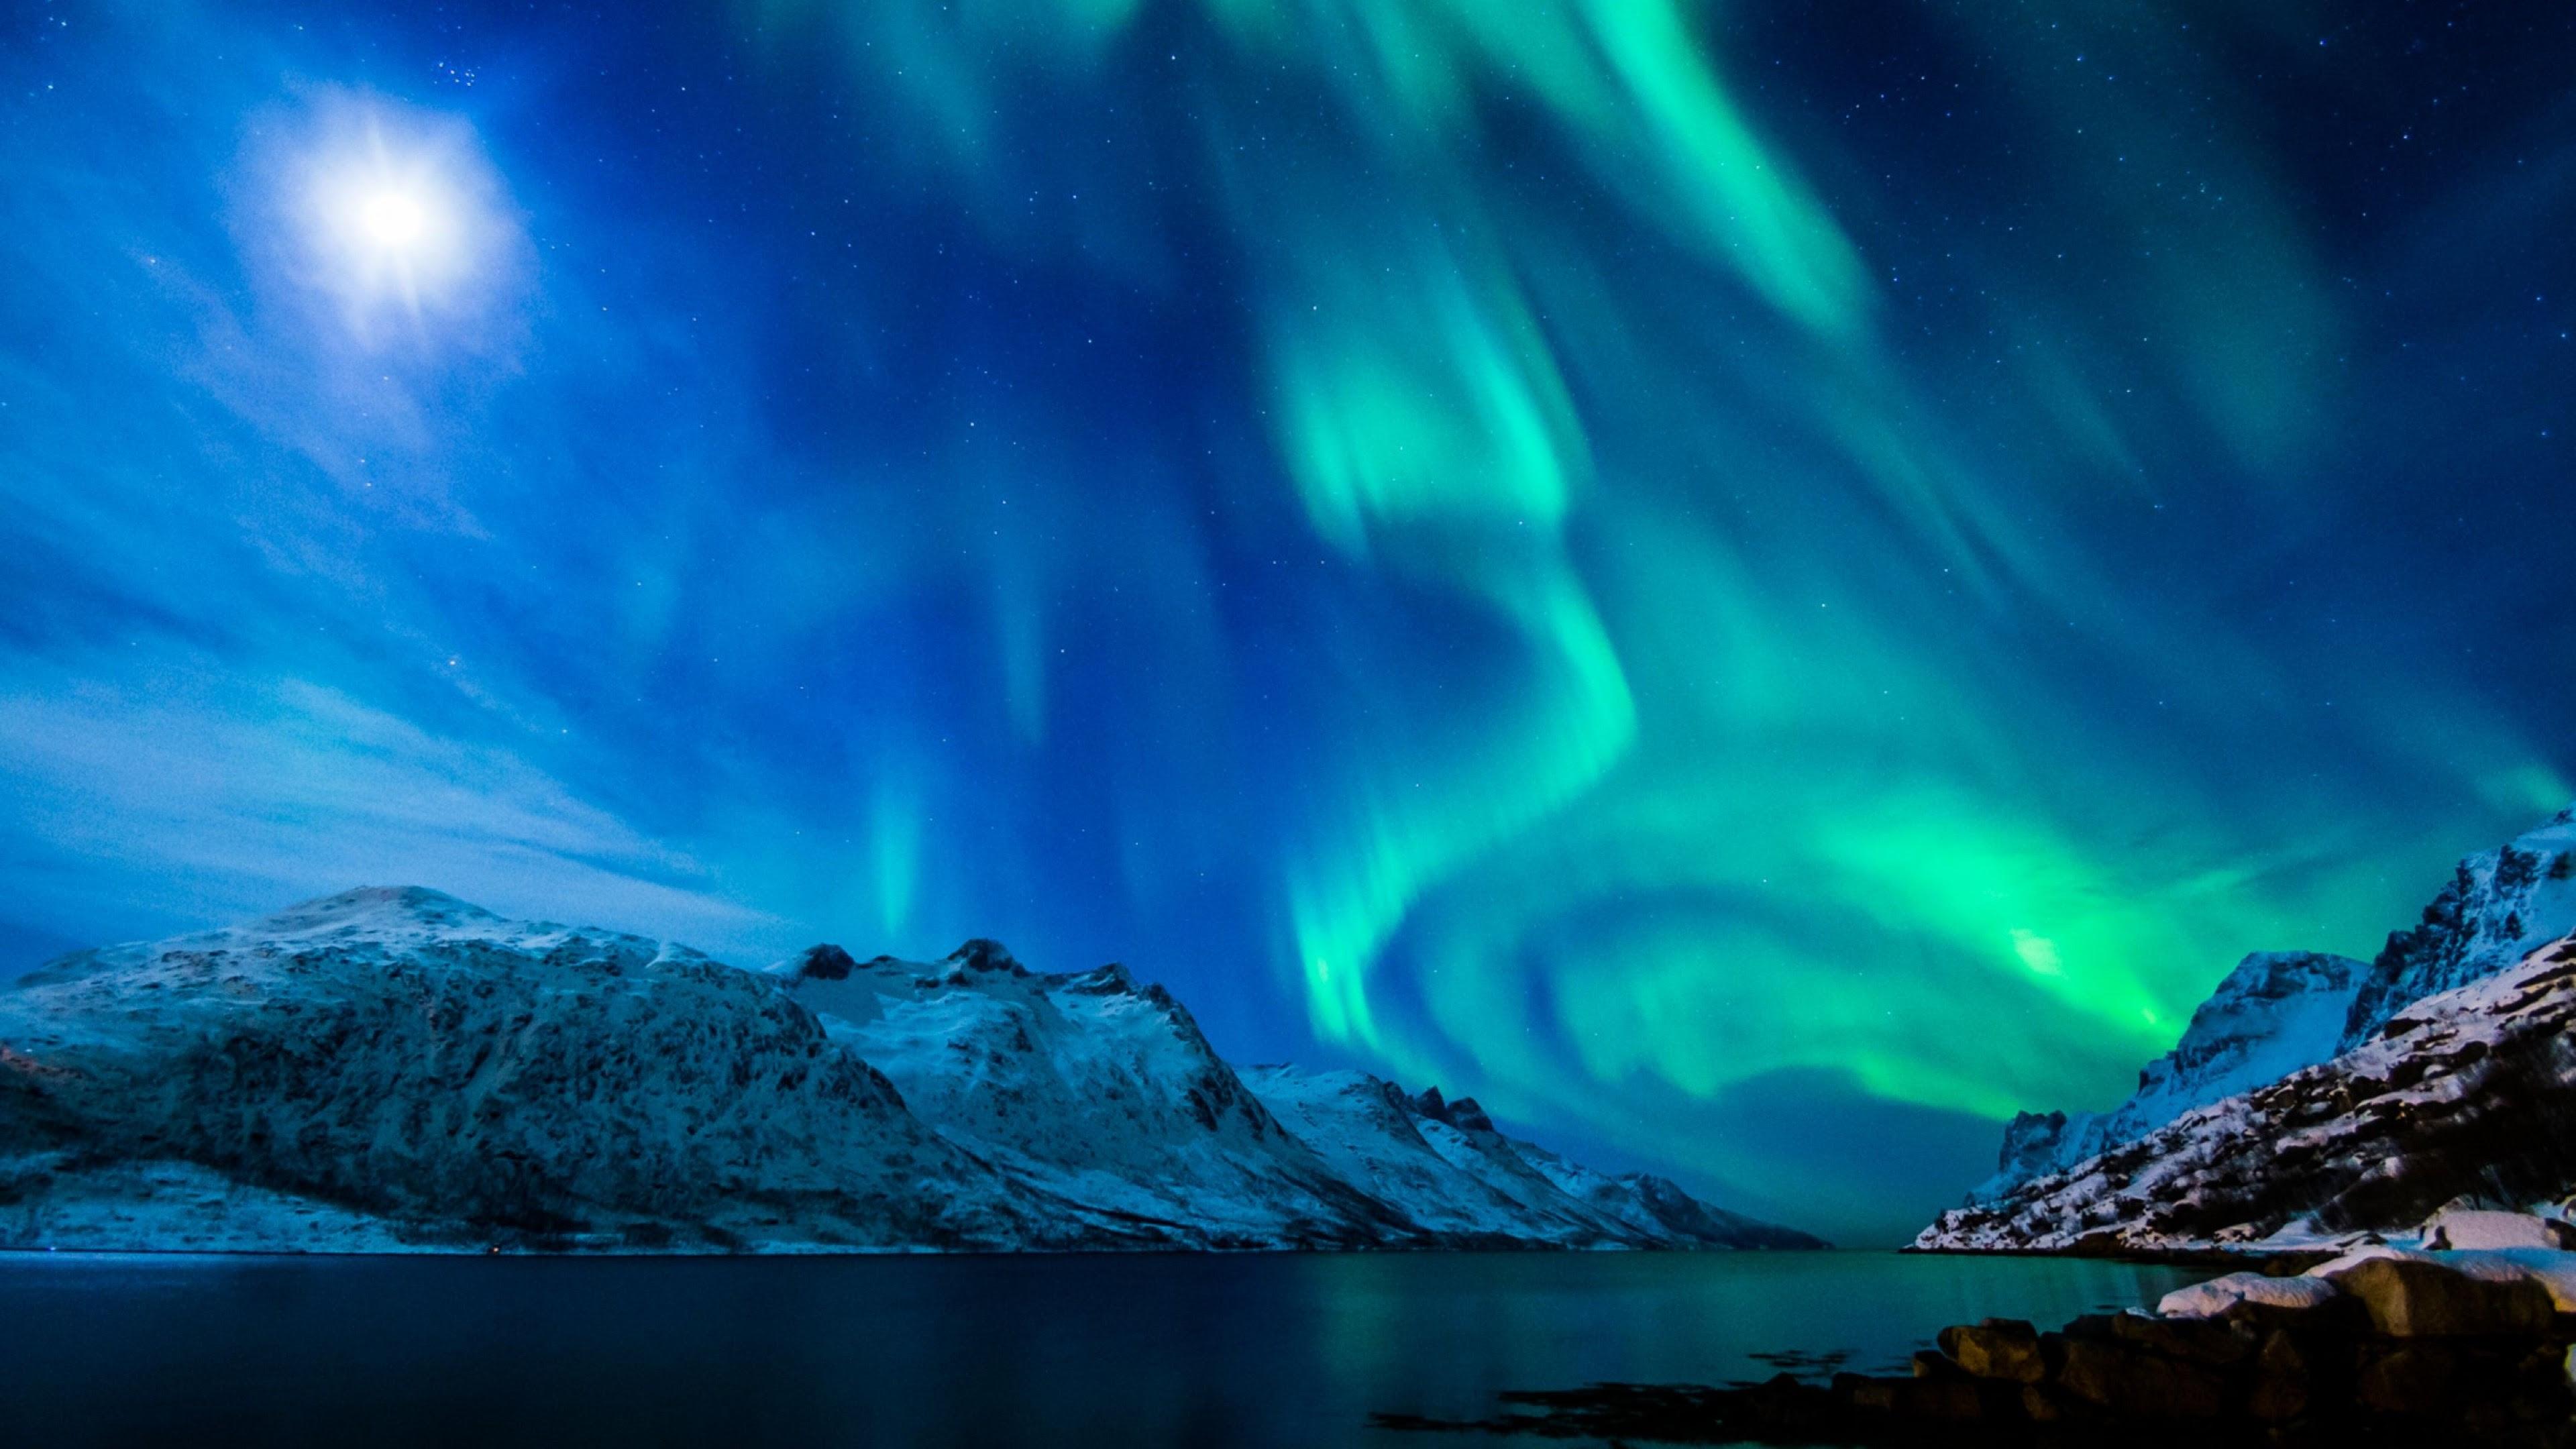 4k Aurora Wallpaper 51 Images